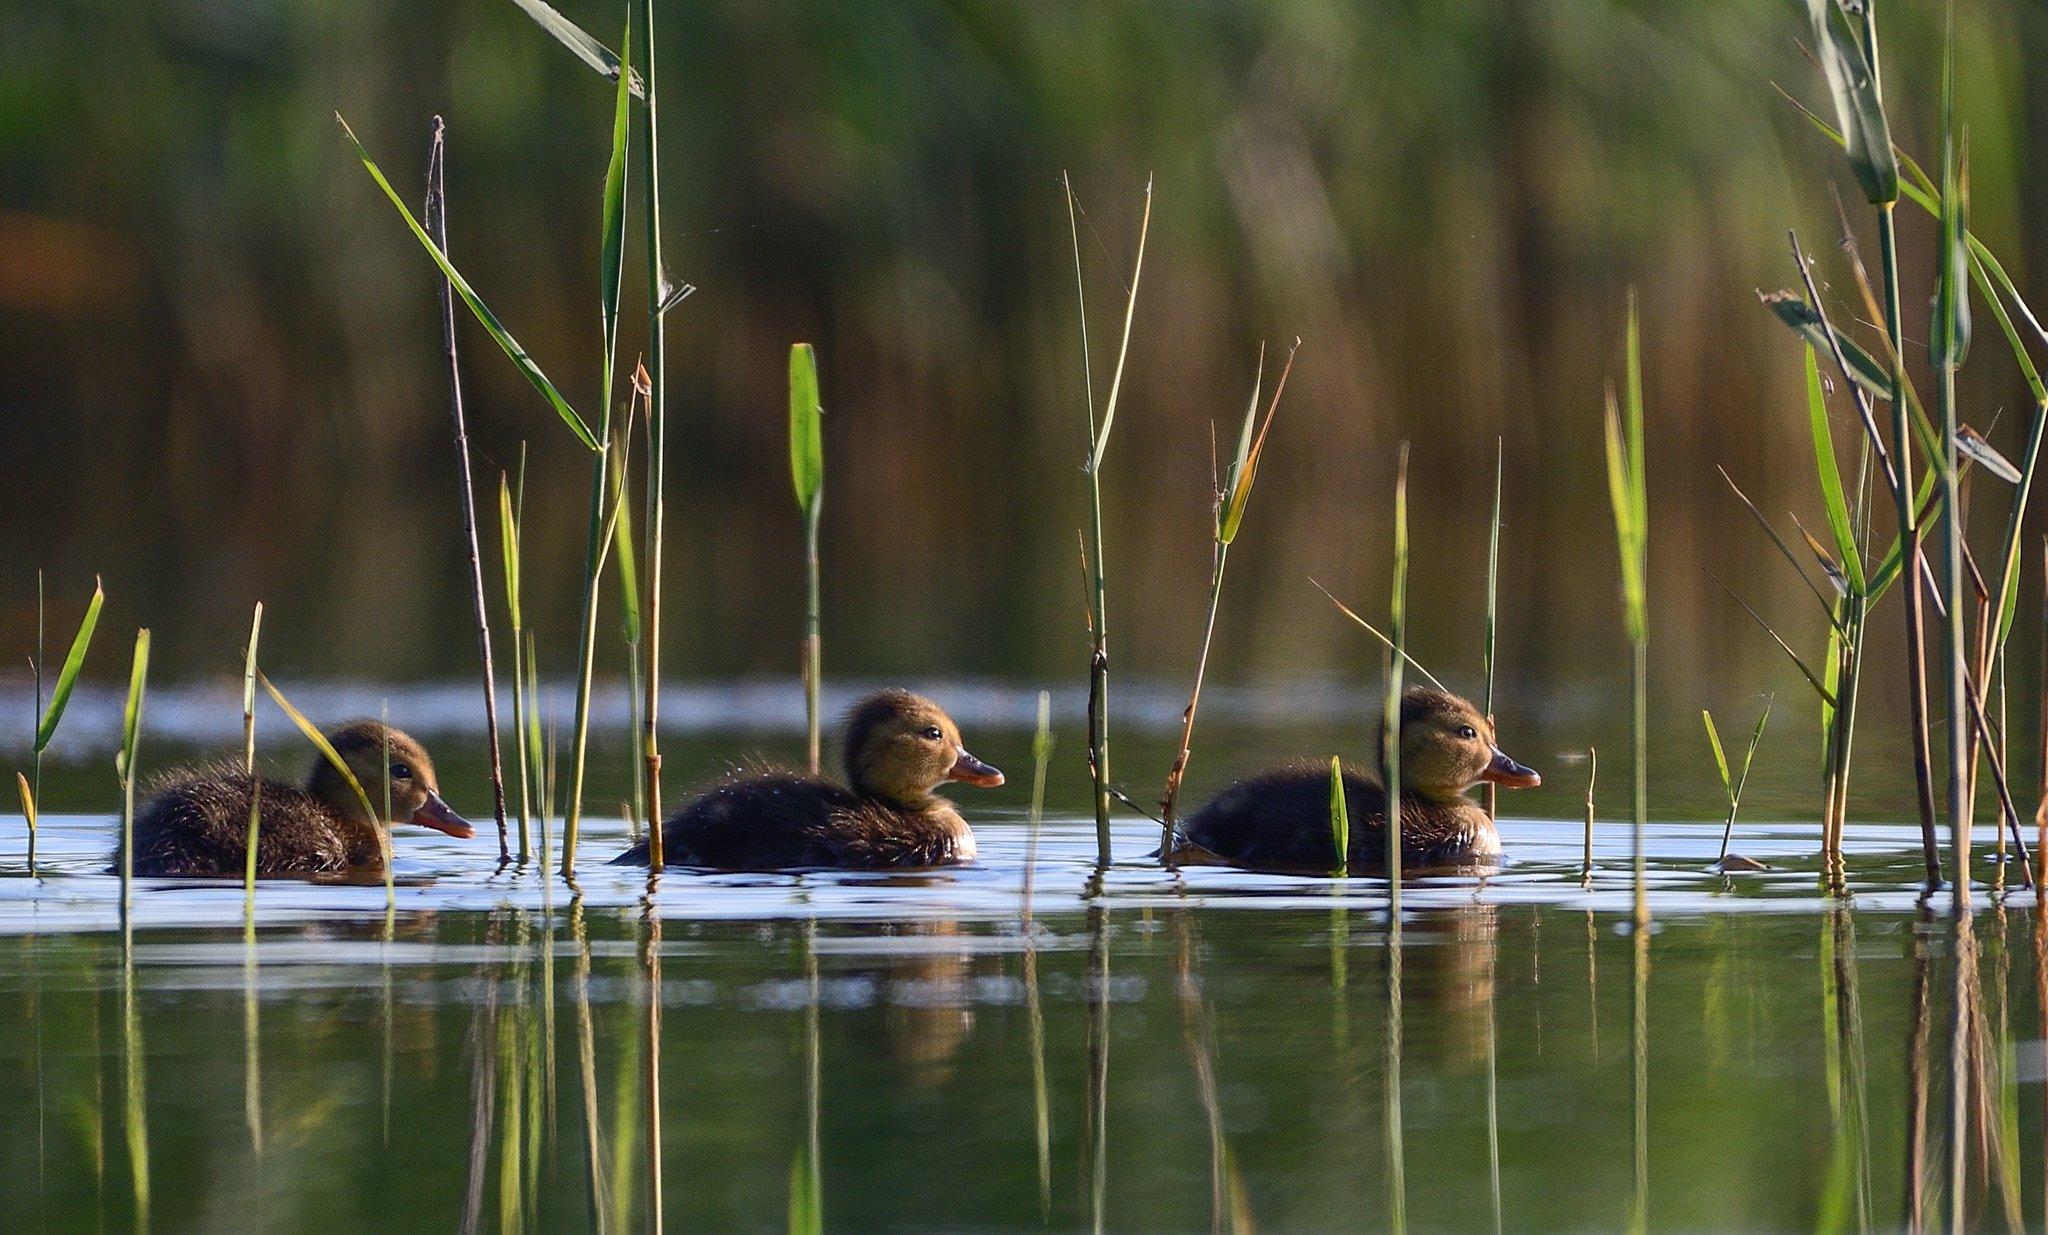 bird, duck, water, lake, reed, green, little, Димитър Русев